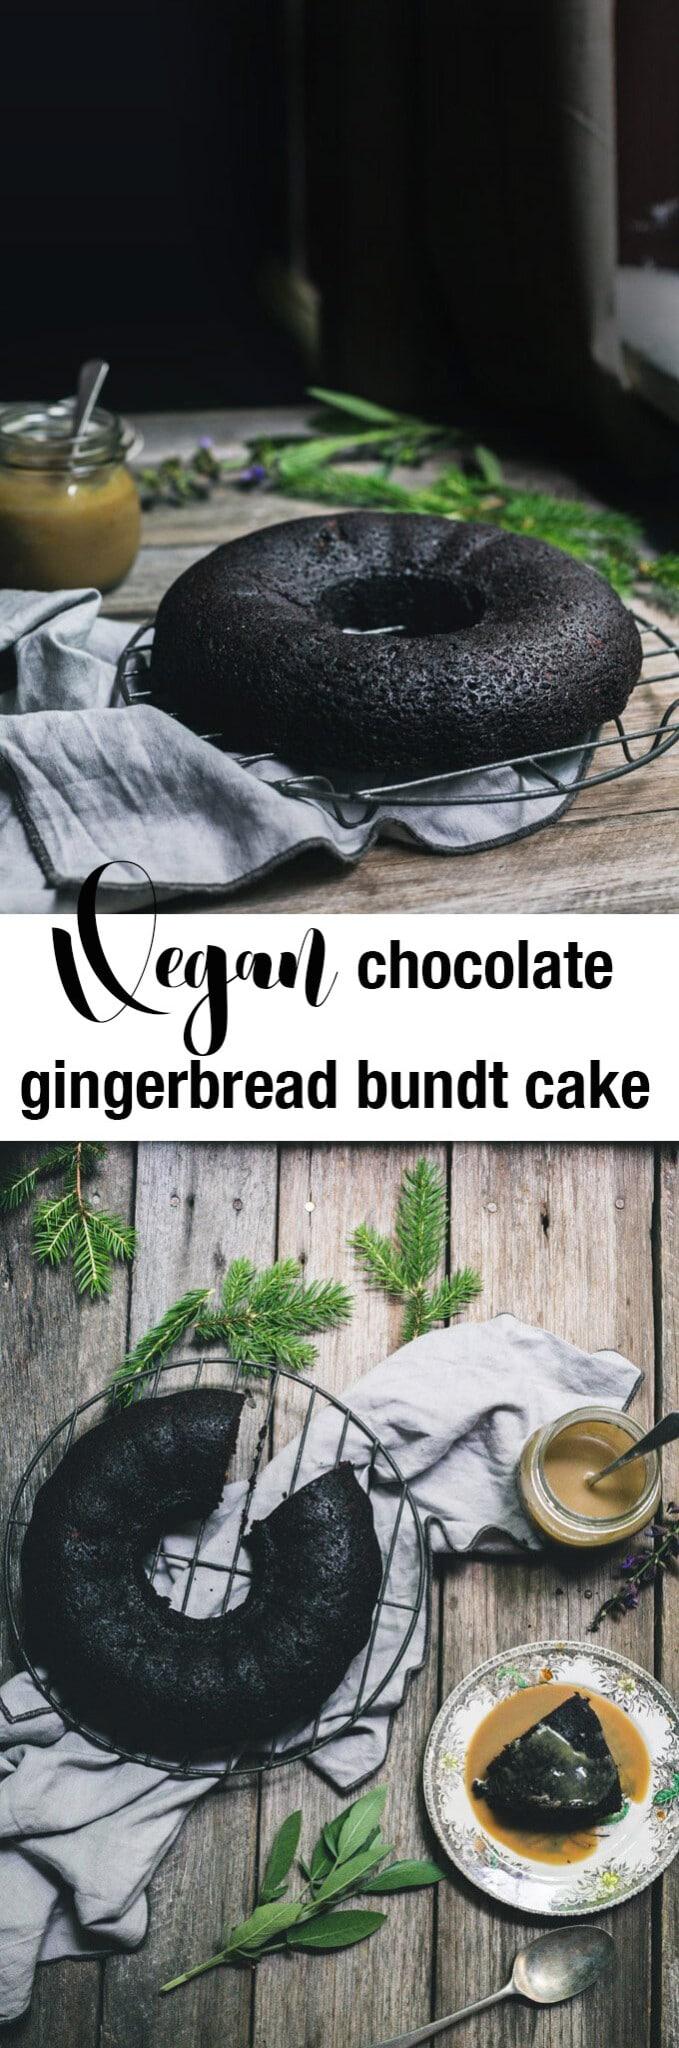 Vegan Chocolate Gingerbread Bundt Cake